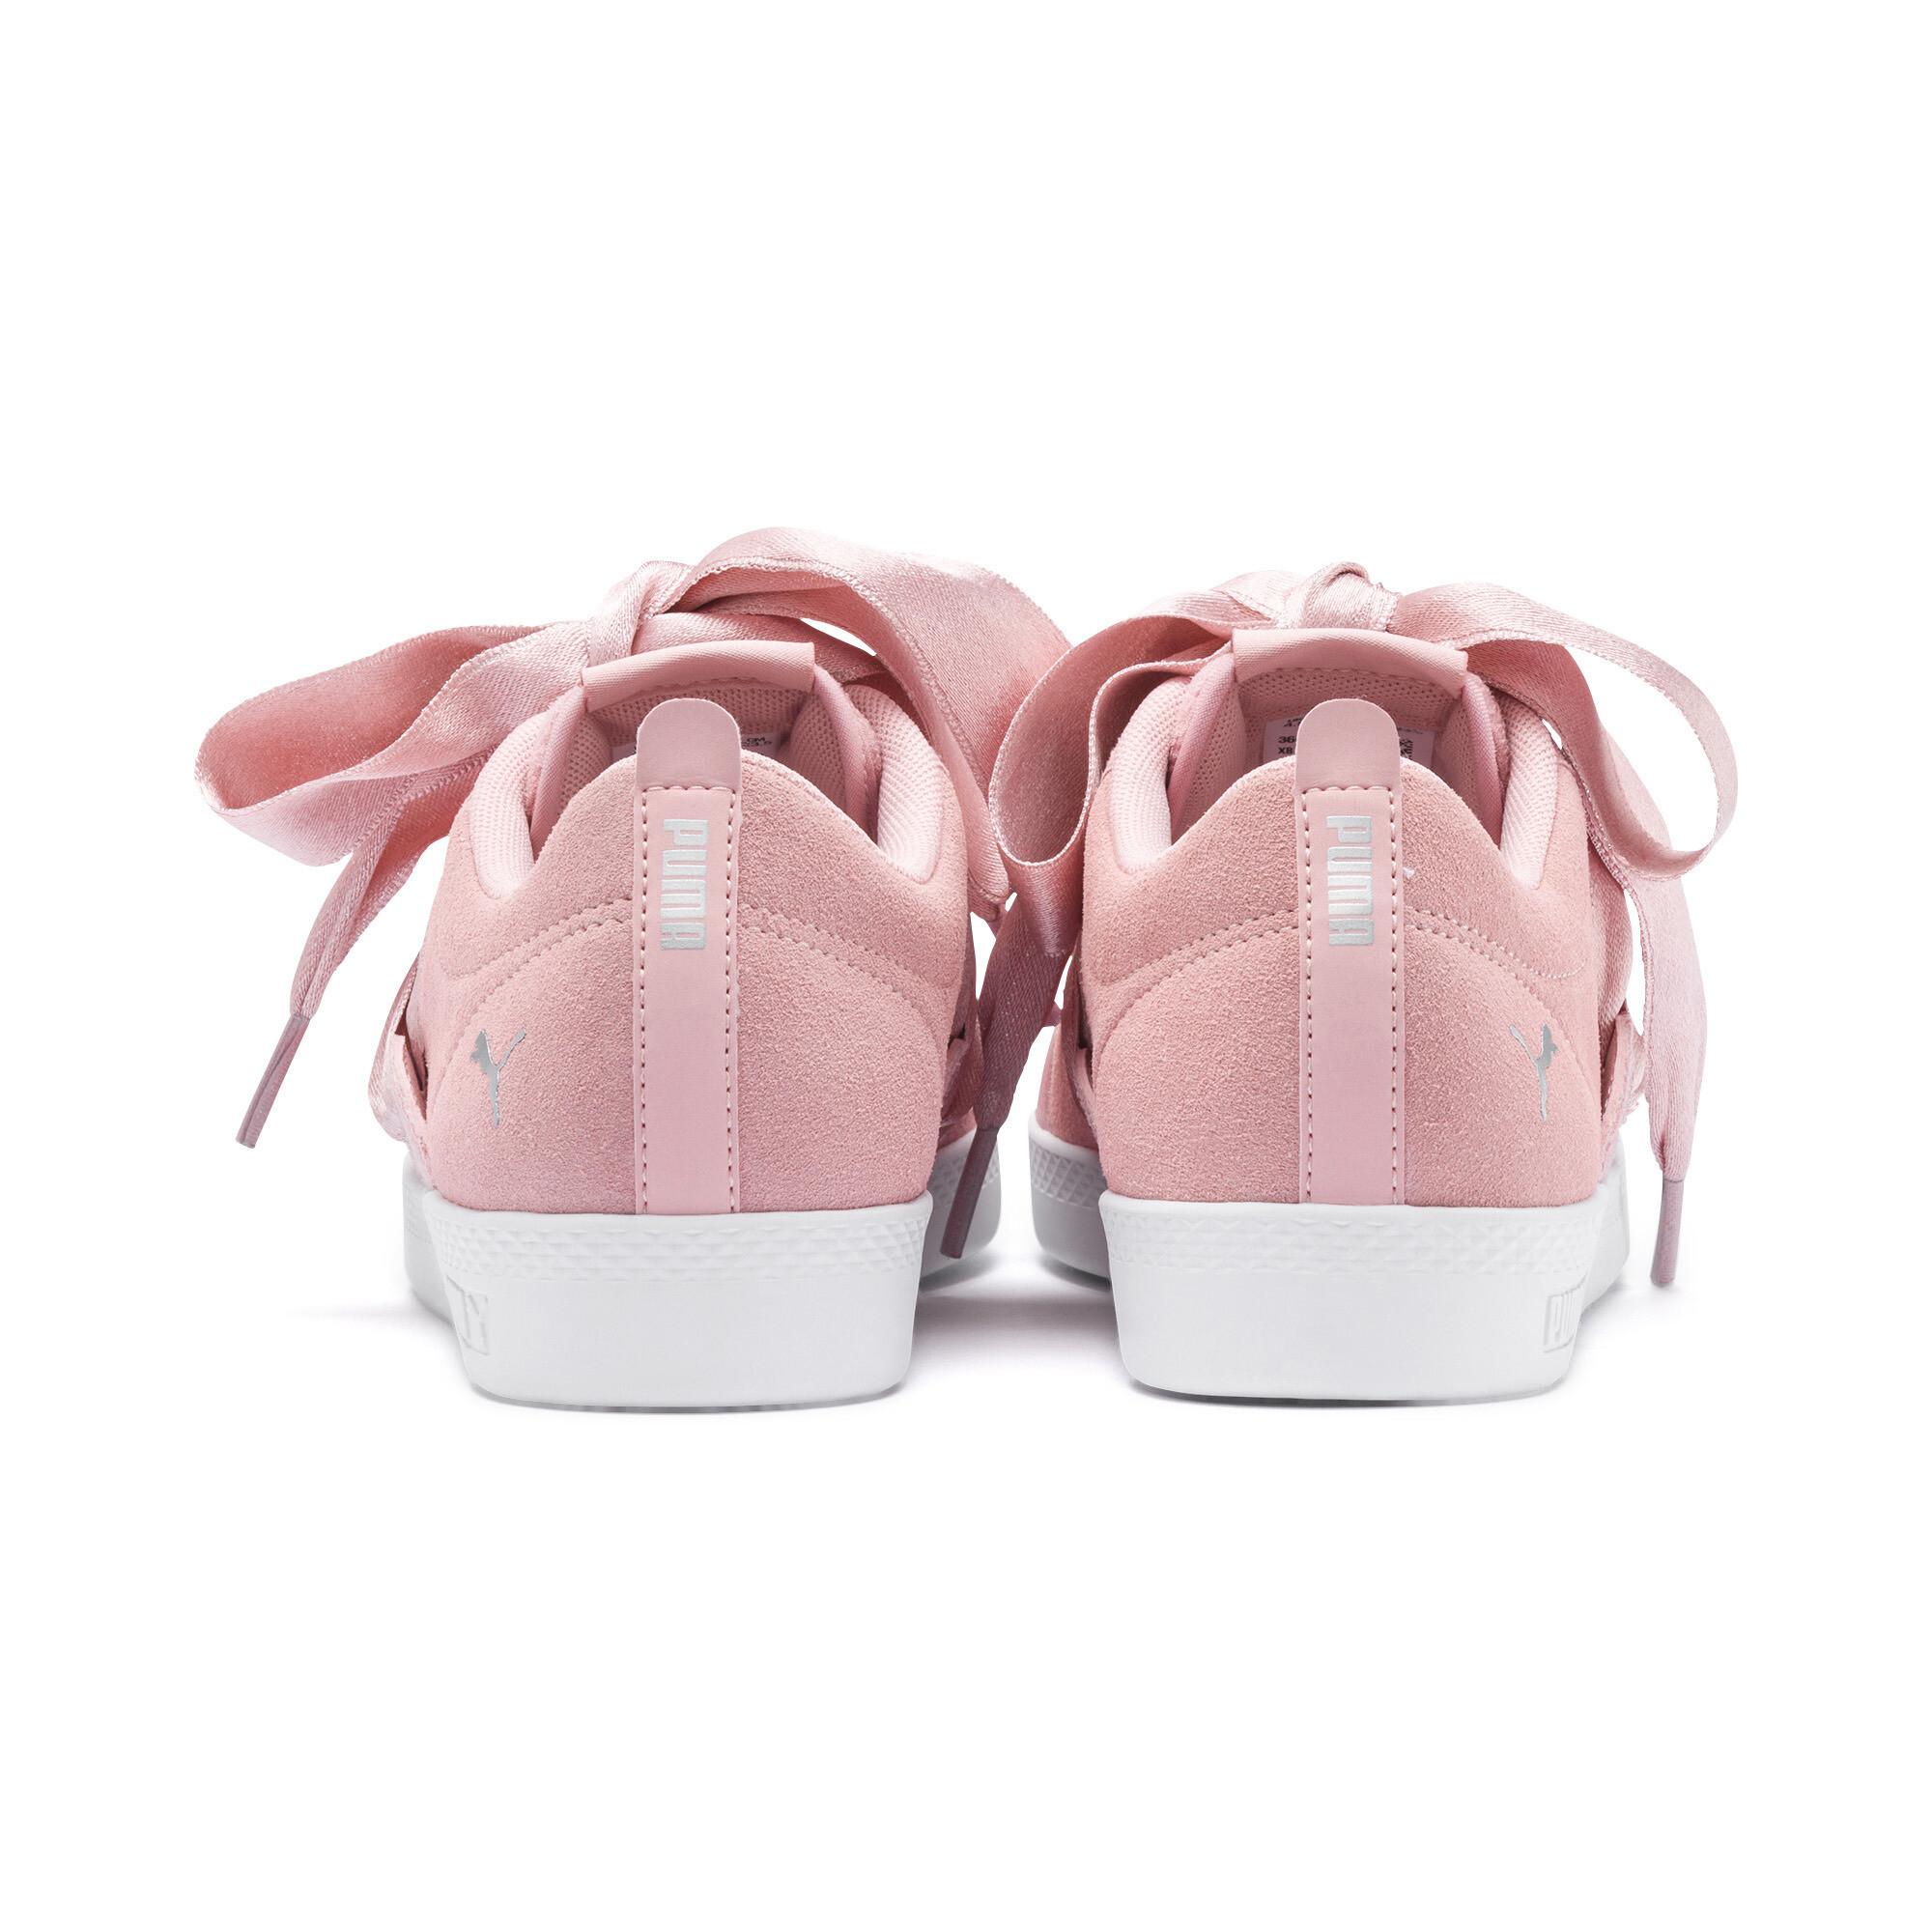 PUMA-PUMA-Smash-Astral-Buckle-Women-s-Sneakers-Women-Shoe-Basics thumbnail 3